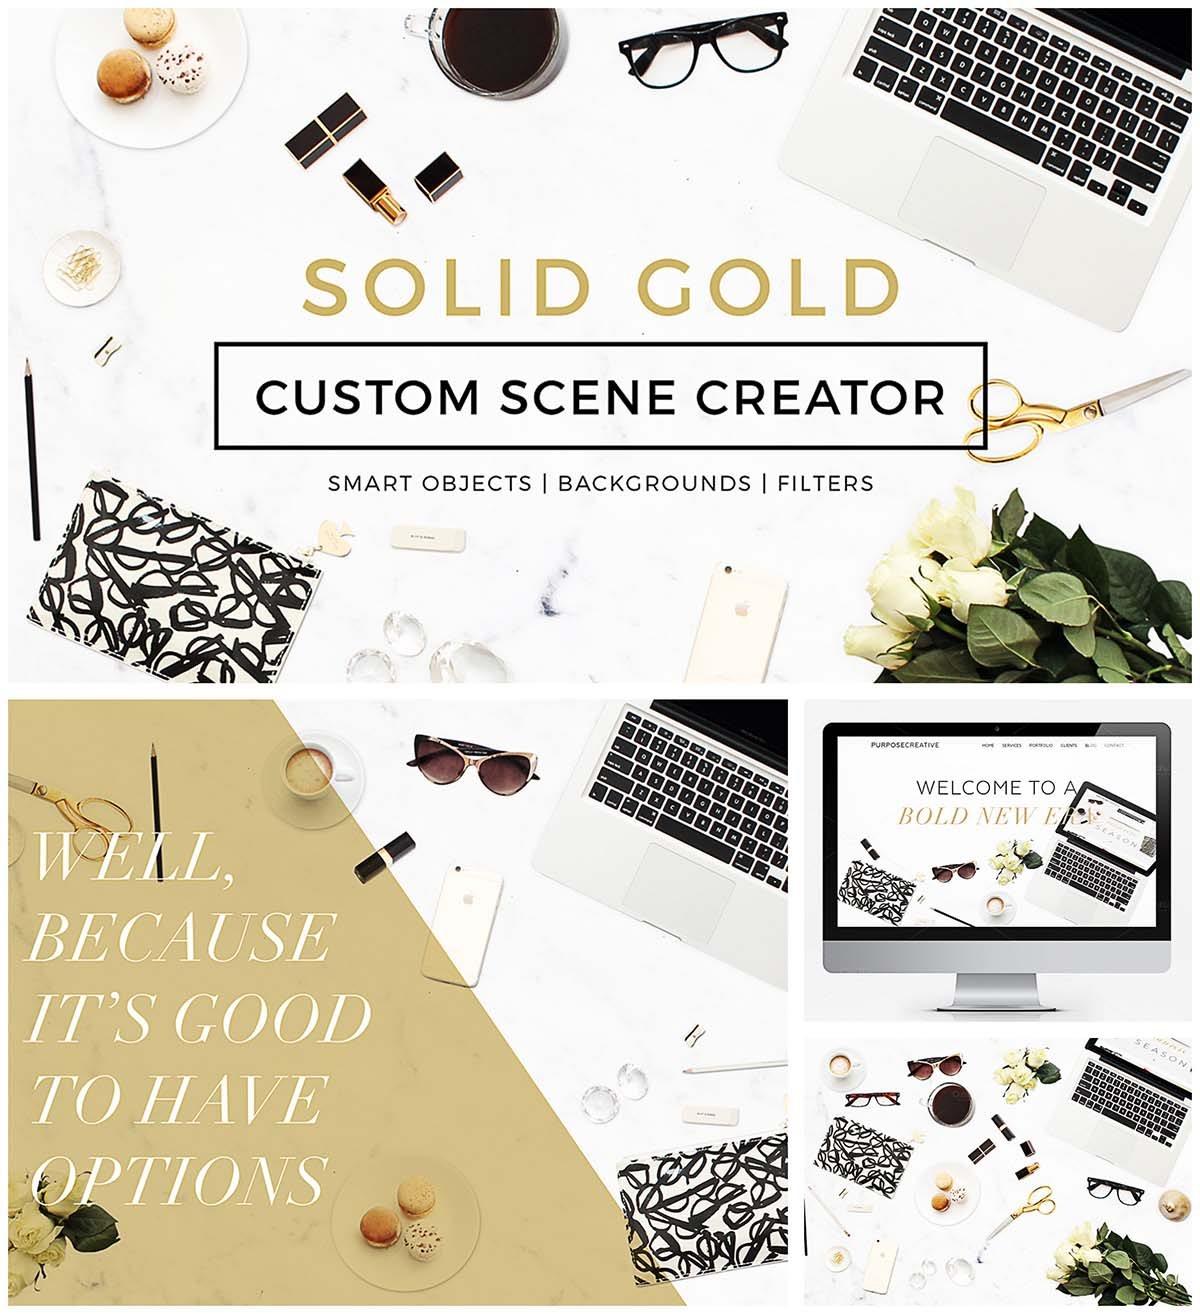 Solid gold custom scene creator